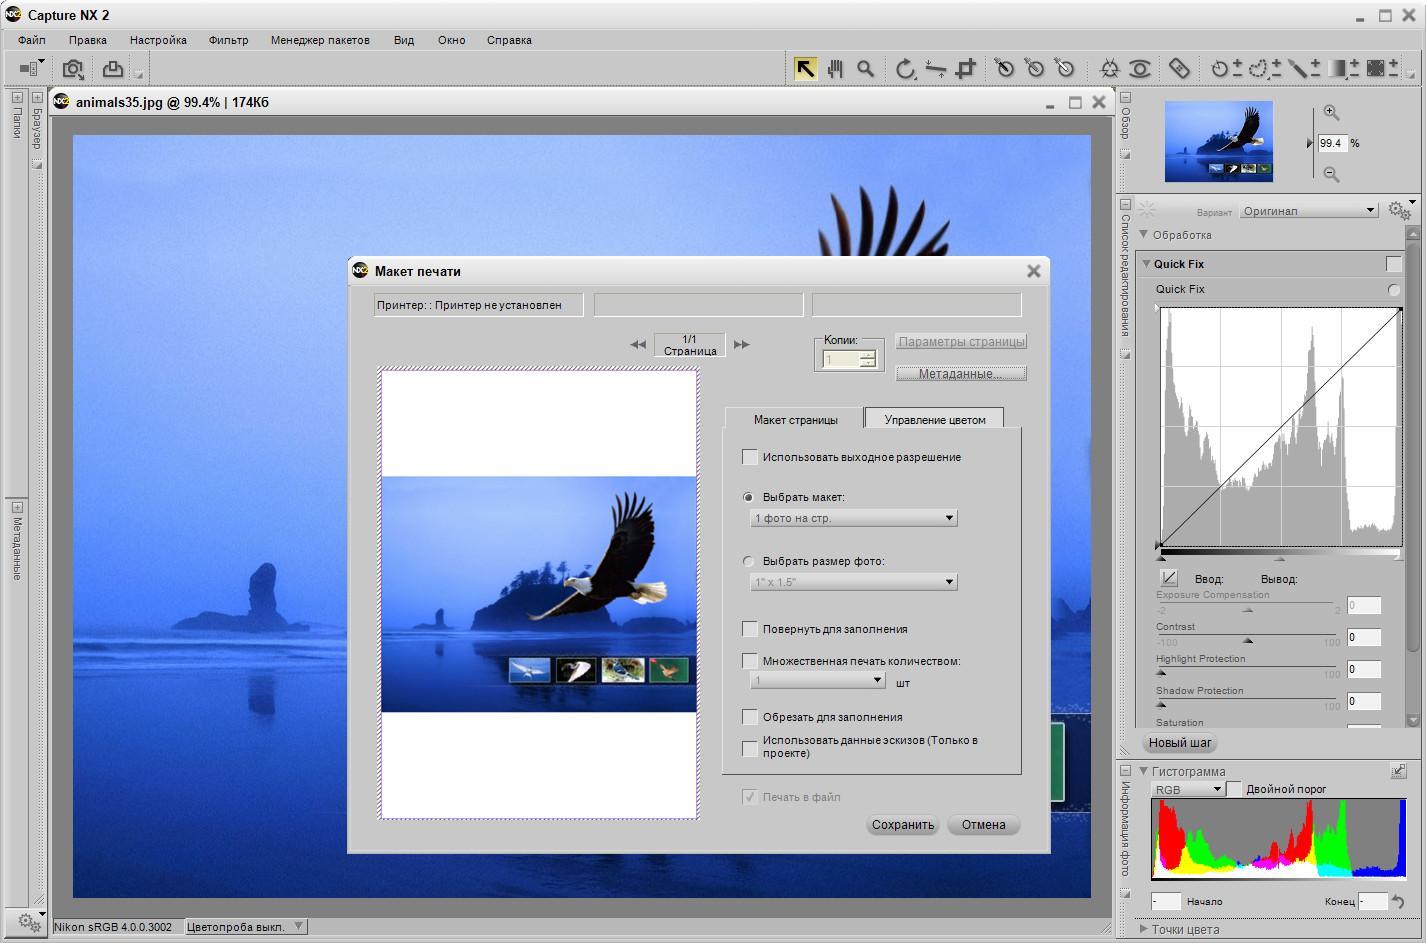 Luckyisocorporation capture nx 2 crack download nikon capture nx2 baditri Gallery